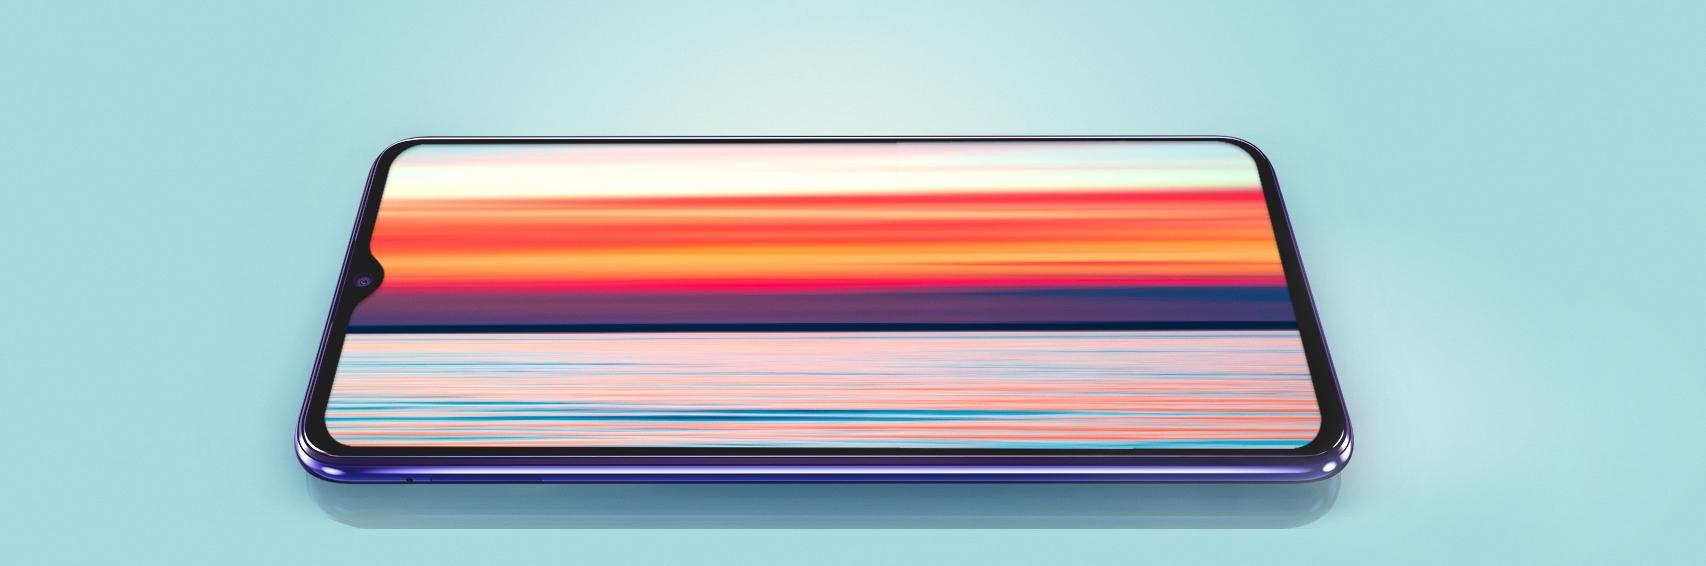 HTC Wildfire X – Display